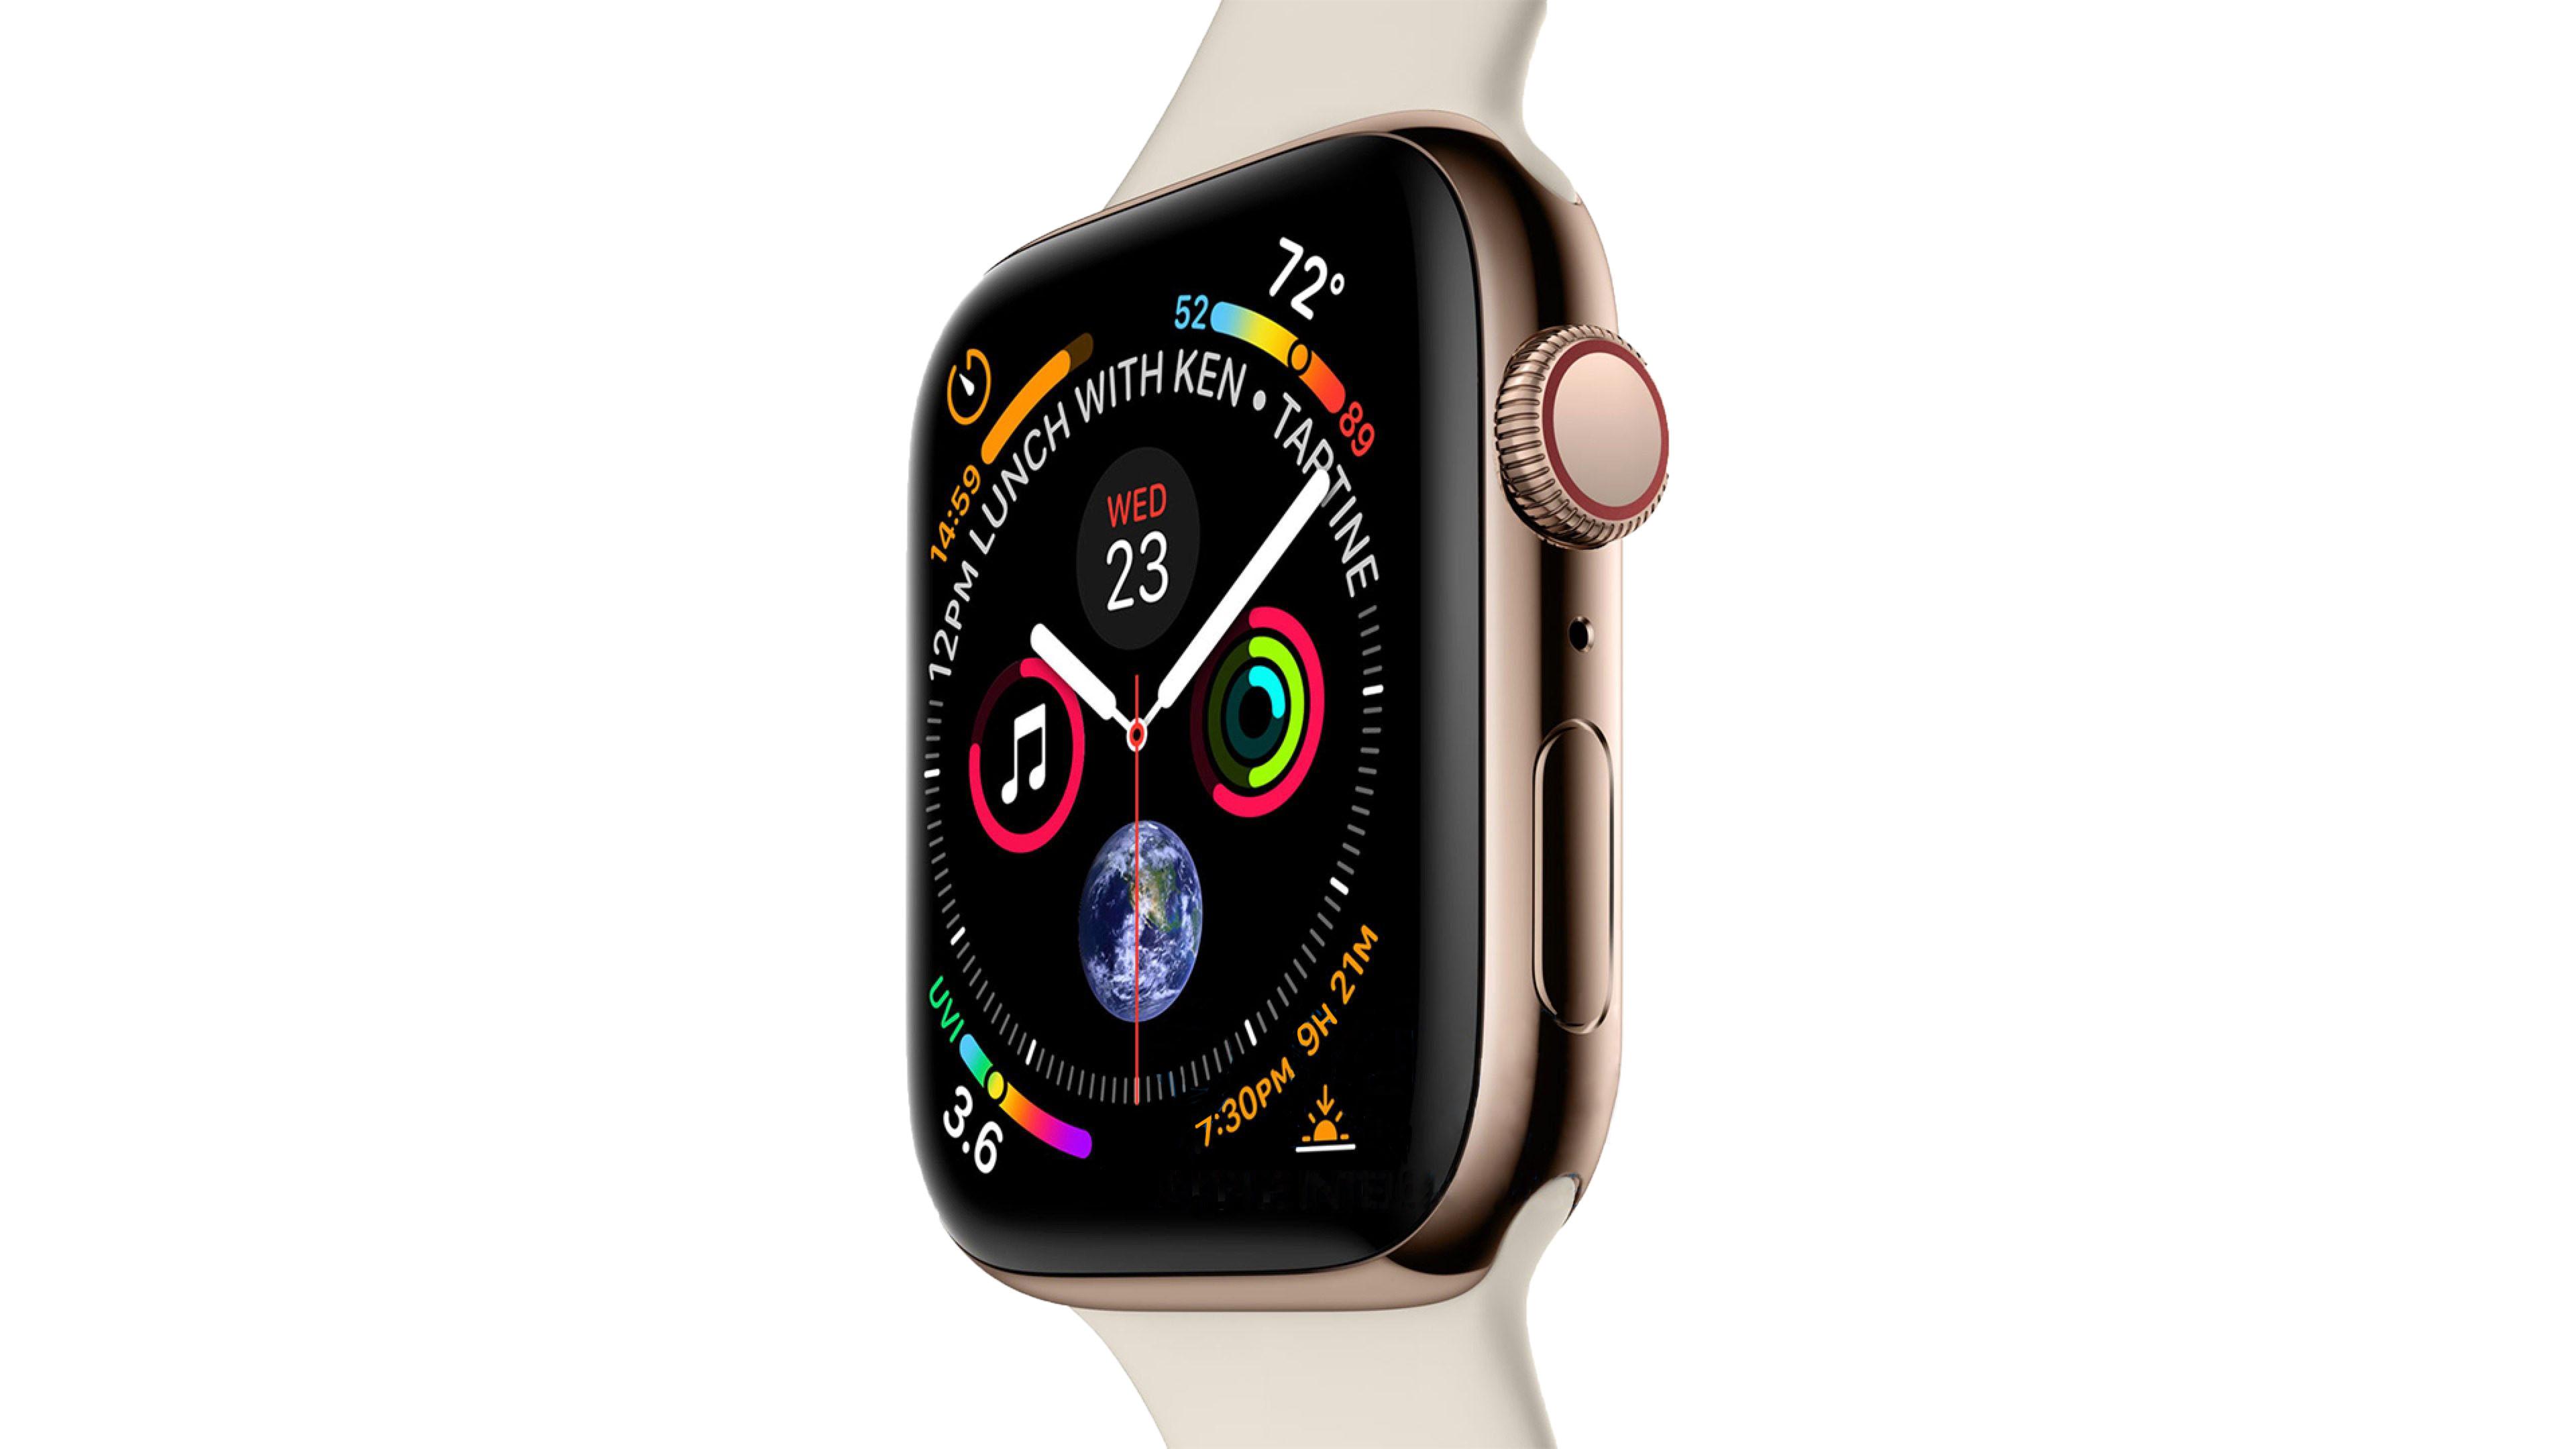 https://www.macfreak.nl/modules/news/images/zArt.AppleWatch_series_4.jpg